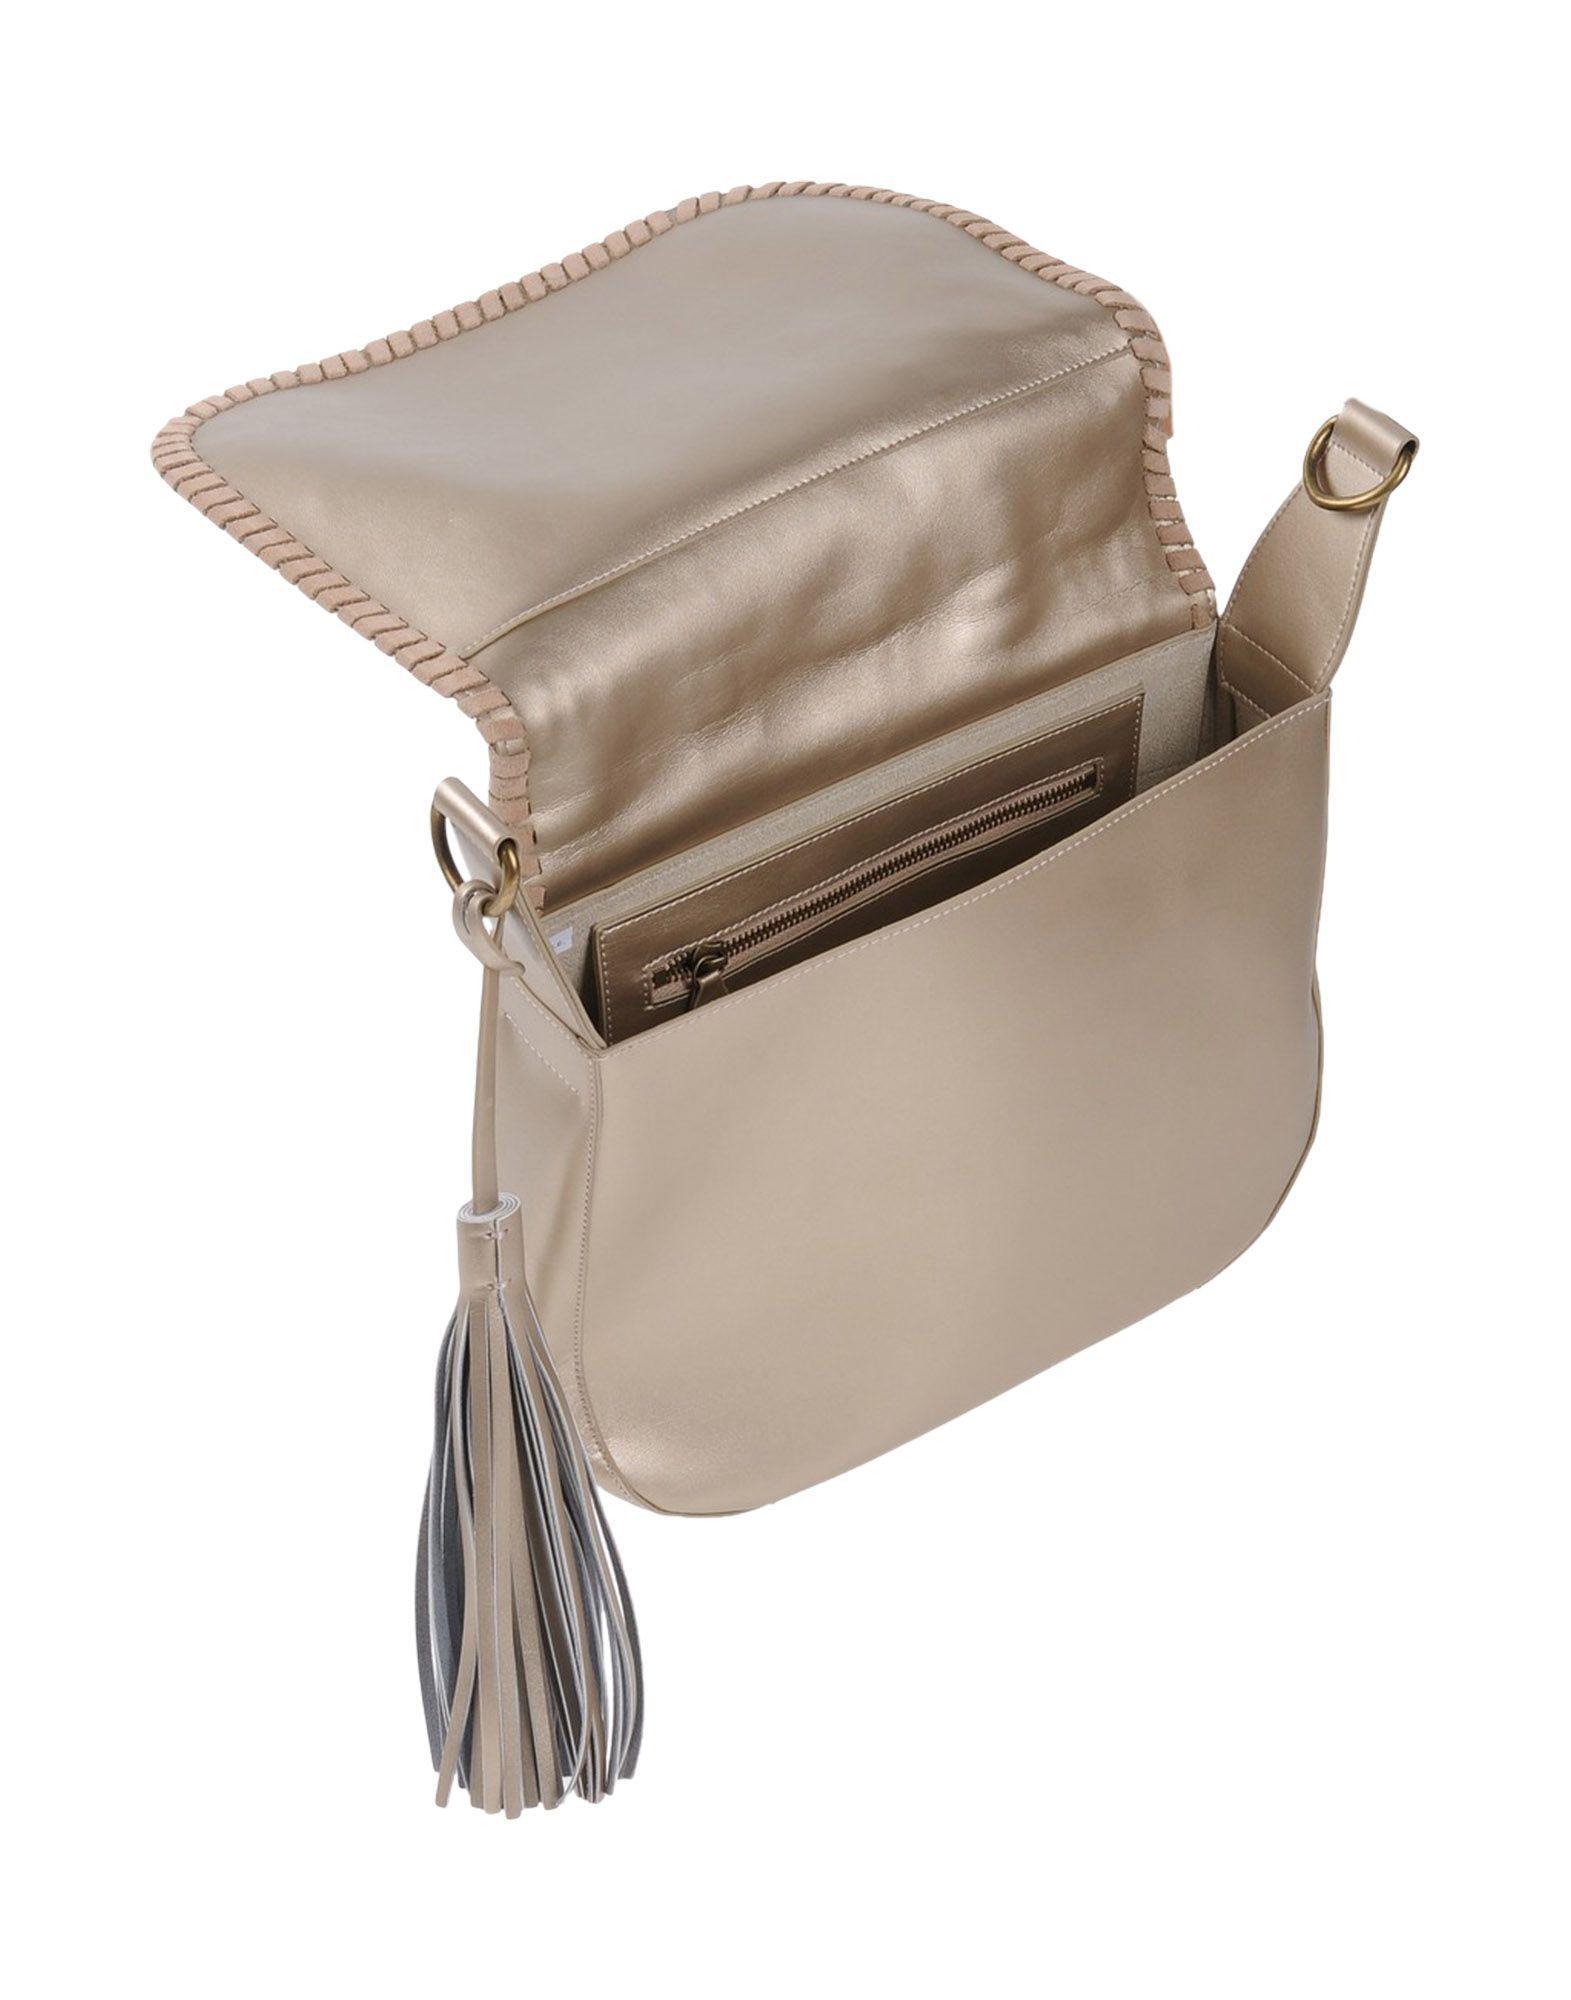 Sacs Bandoulière Cuir Mia Bag